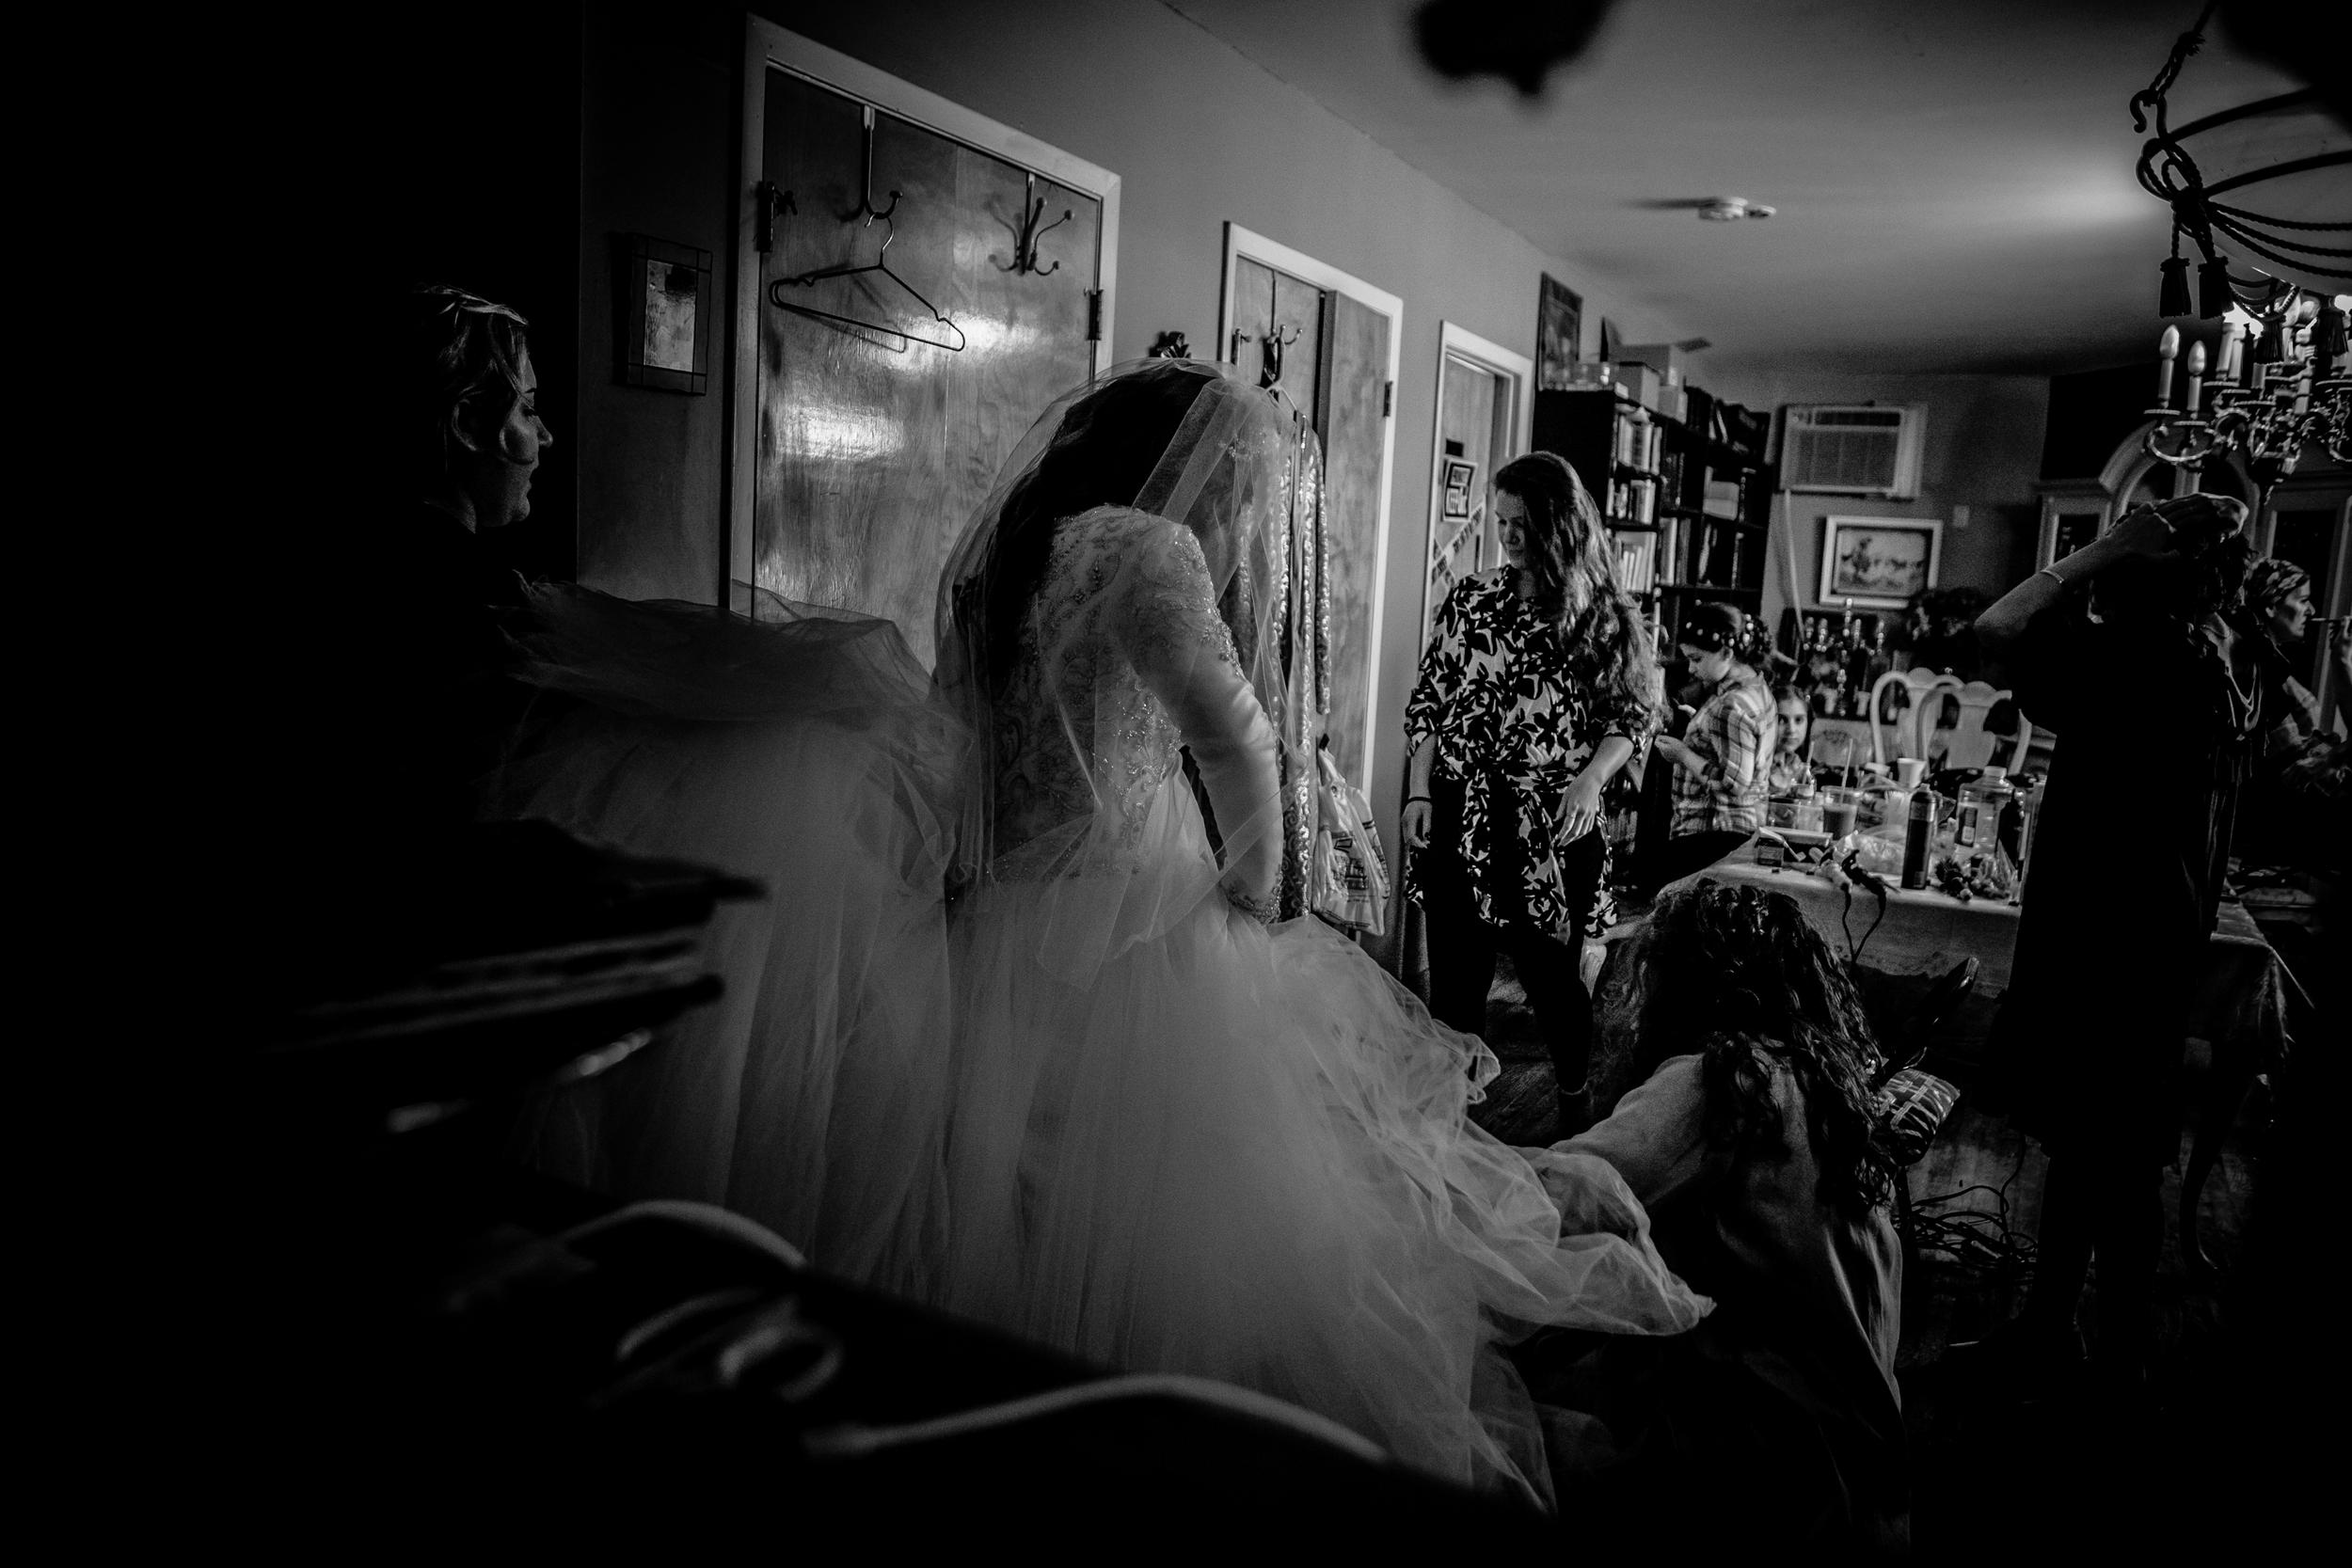 Wedding Iossi and Gitty Khafif  - Eliau Piha studio photography, new york, events, people 770 brooklyn -0050.jpg